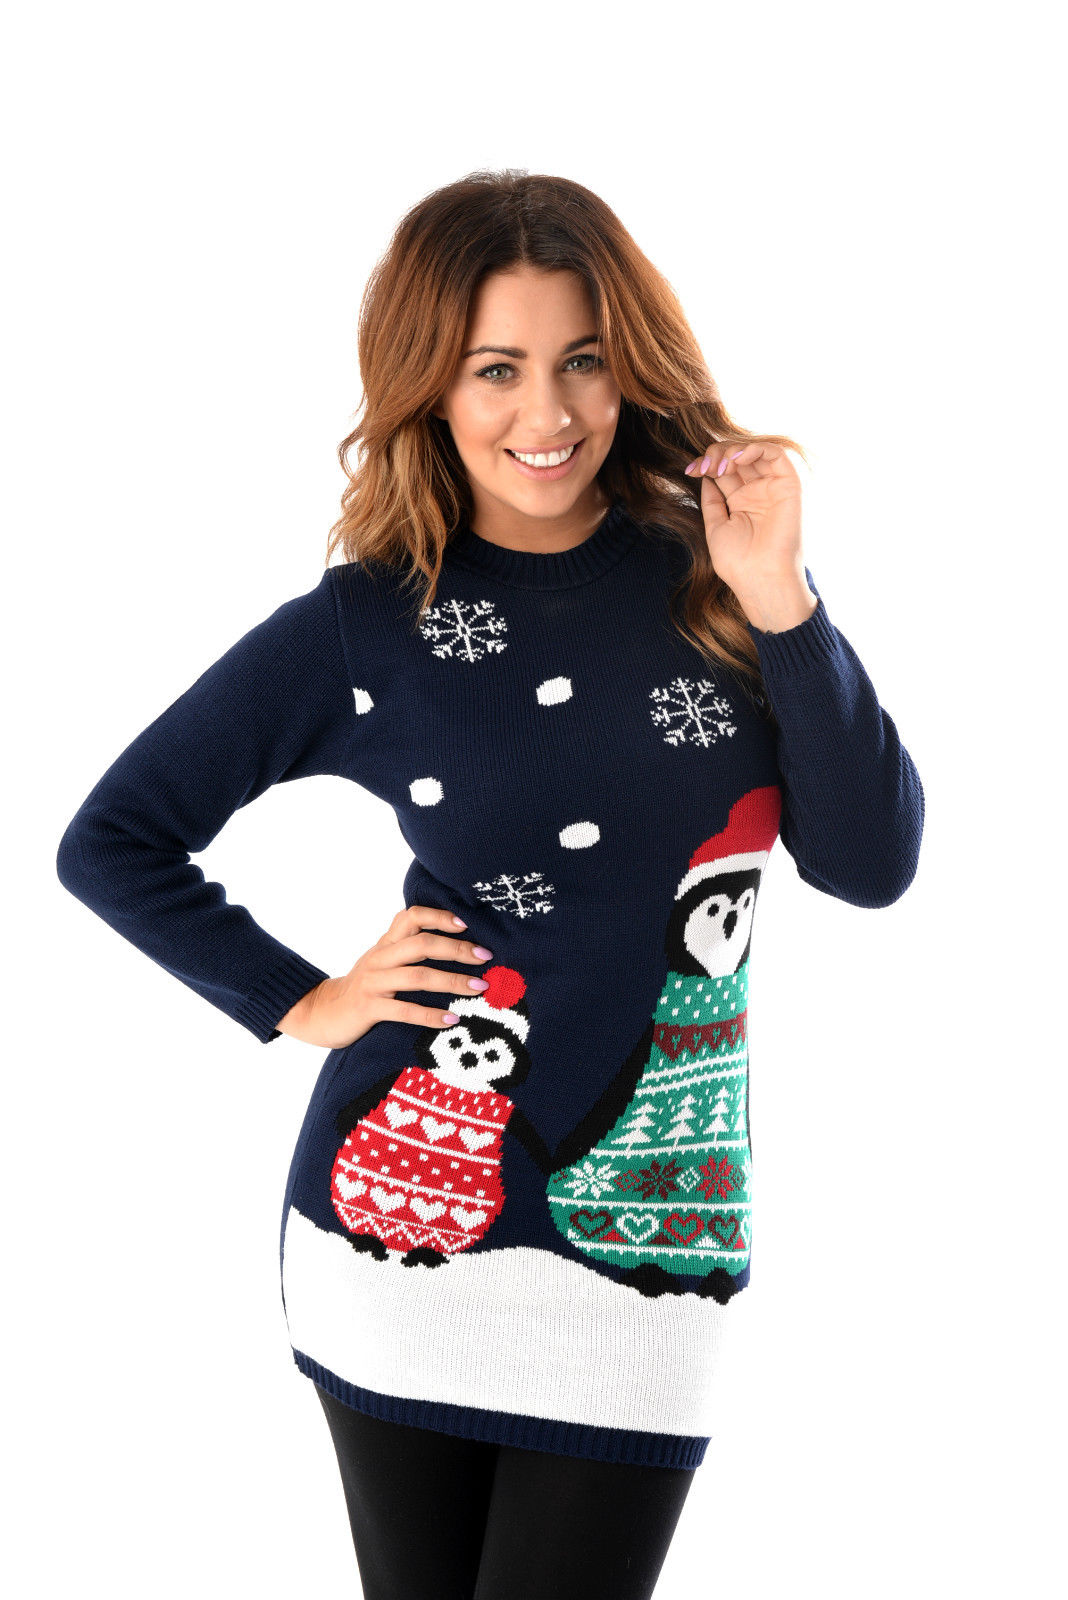 Coole Truien Dames.Tuniek Met Pinguin Coole Sweater Foute Kersttruien Kopen